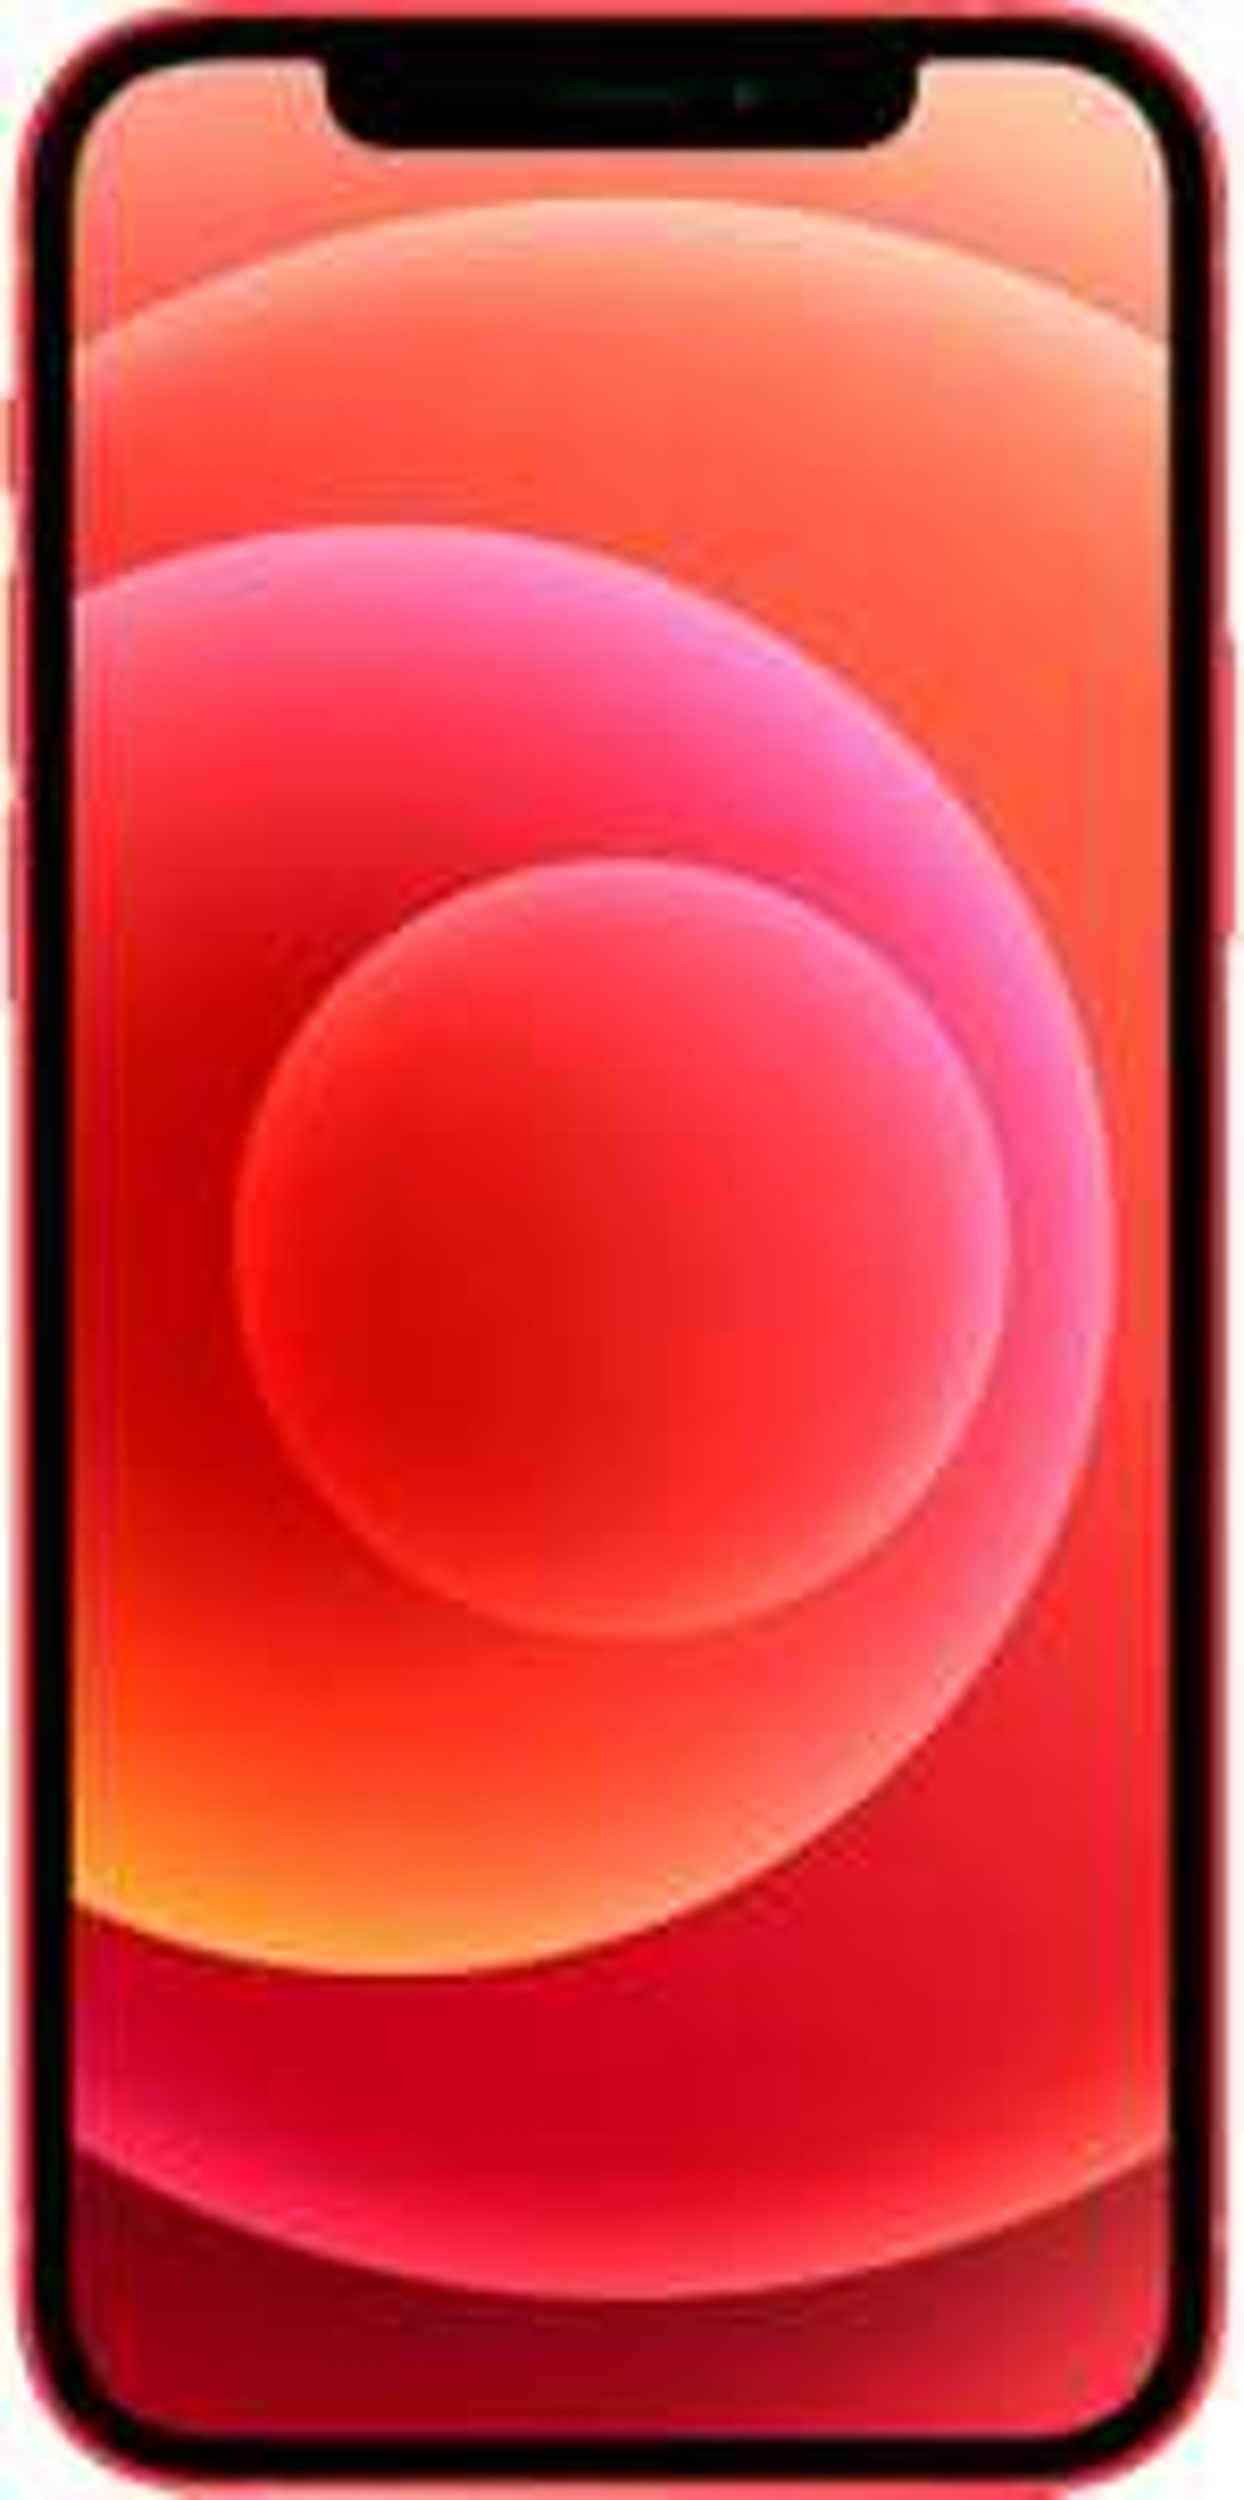 "Smartphone 6.1"" Apple iPhone 12 - 64 Go, Plusieurs coloris (Frontaliers Suisse)"